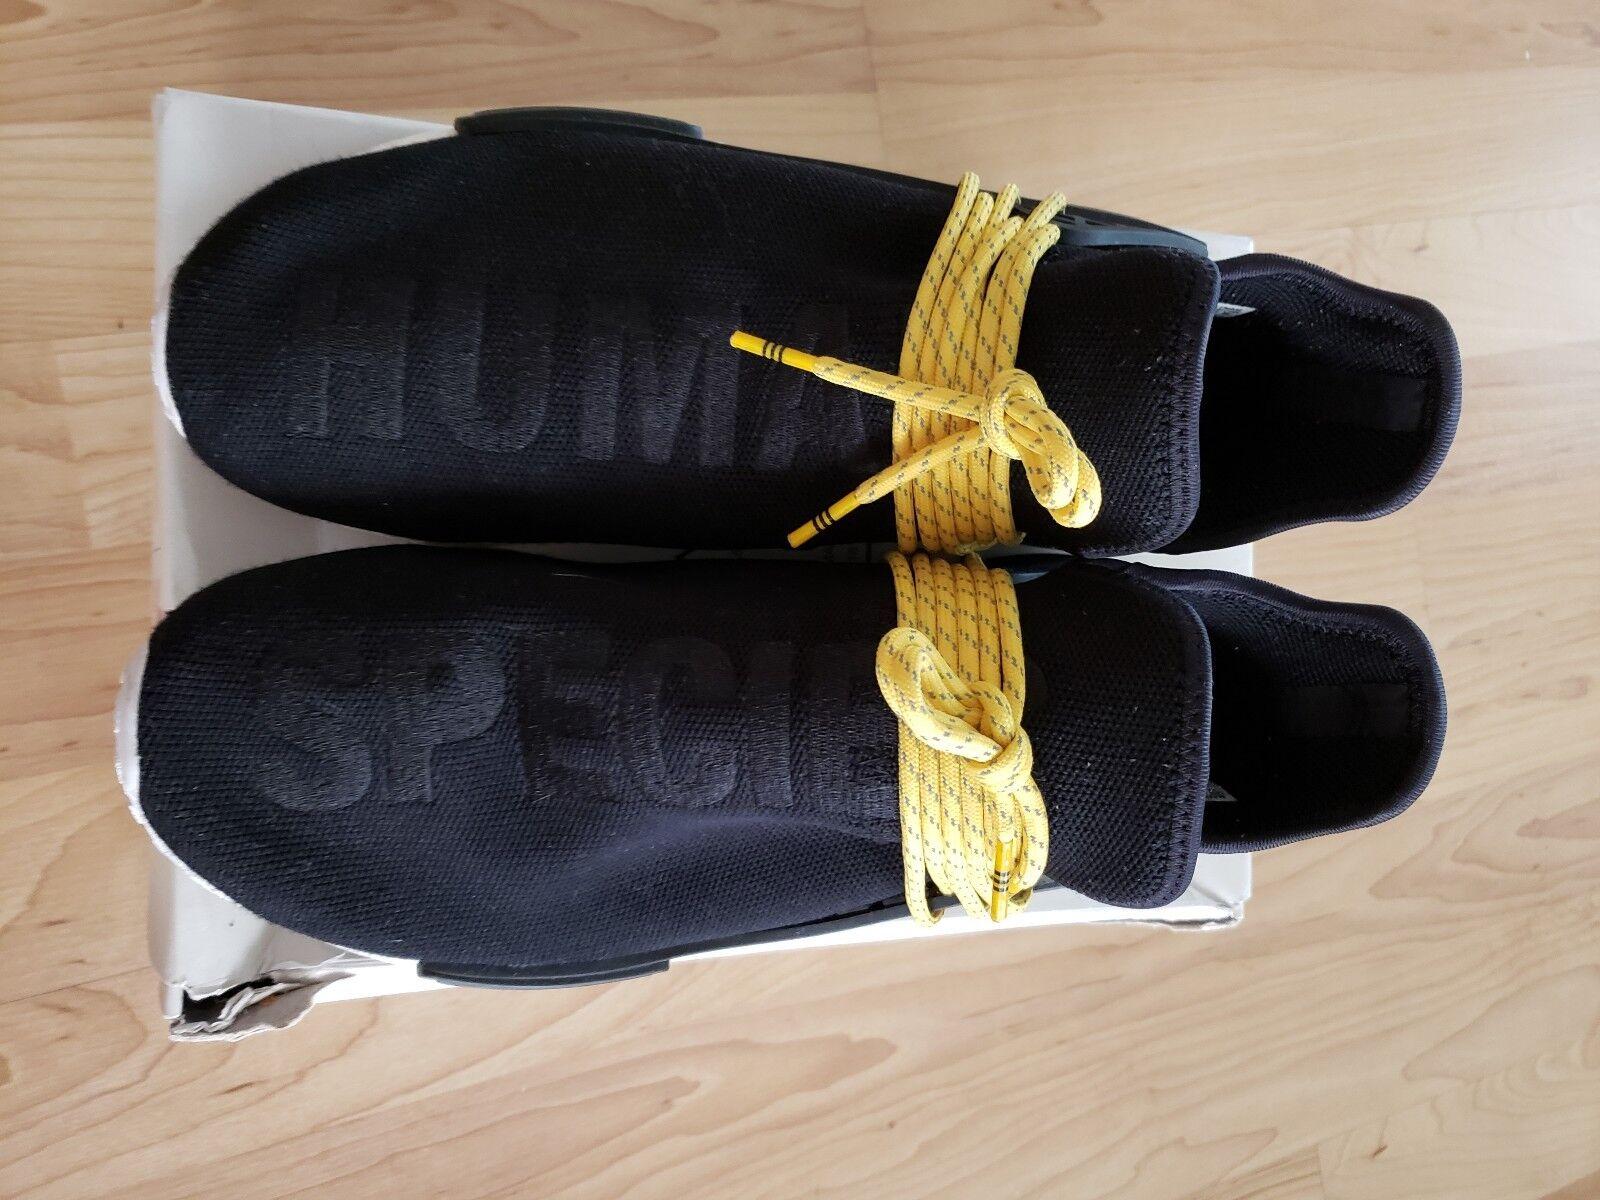 Adidas (BB3068) NMD Human Race Black Human Species Sz 11 Lightly Worn w  Box